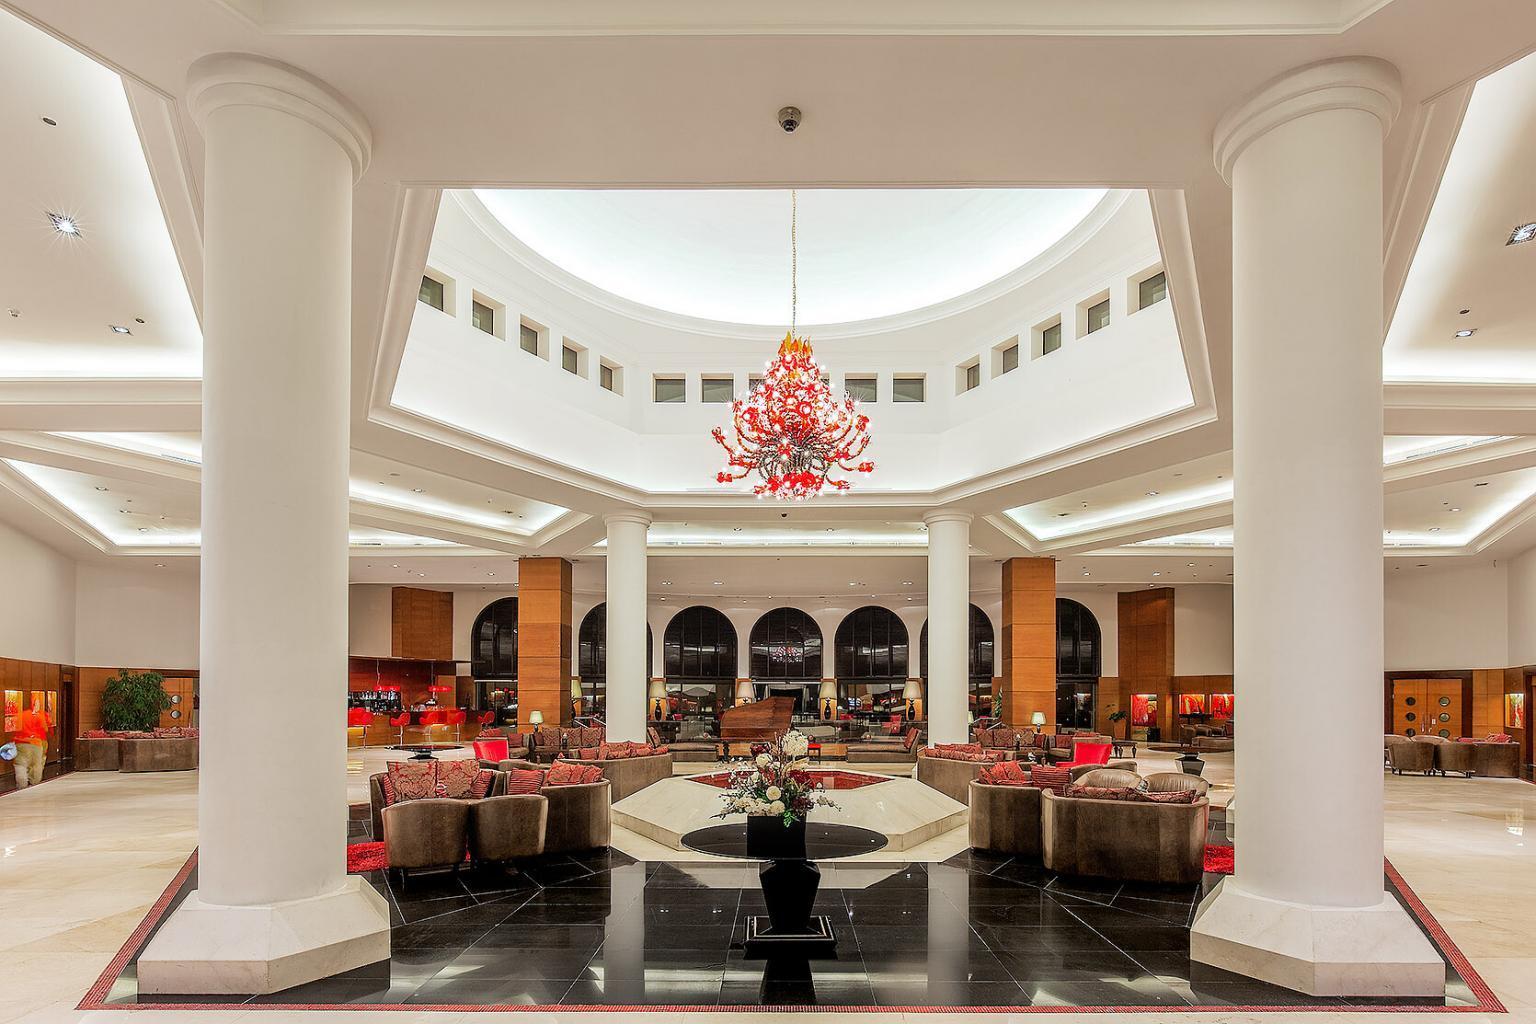 Hotel_Lobby_Interior_Photo_PanaViz-1